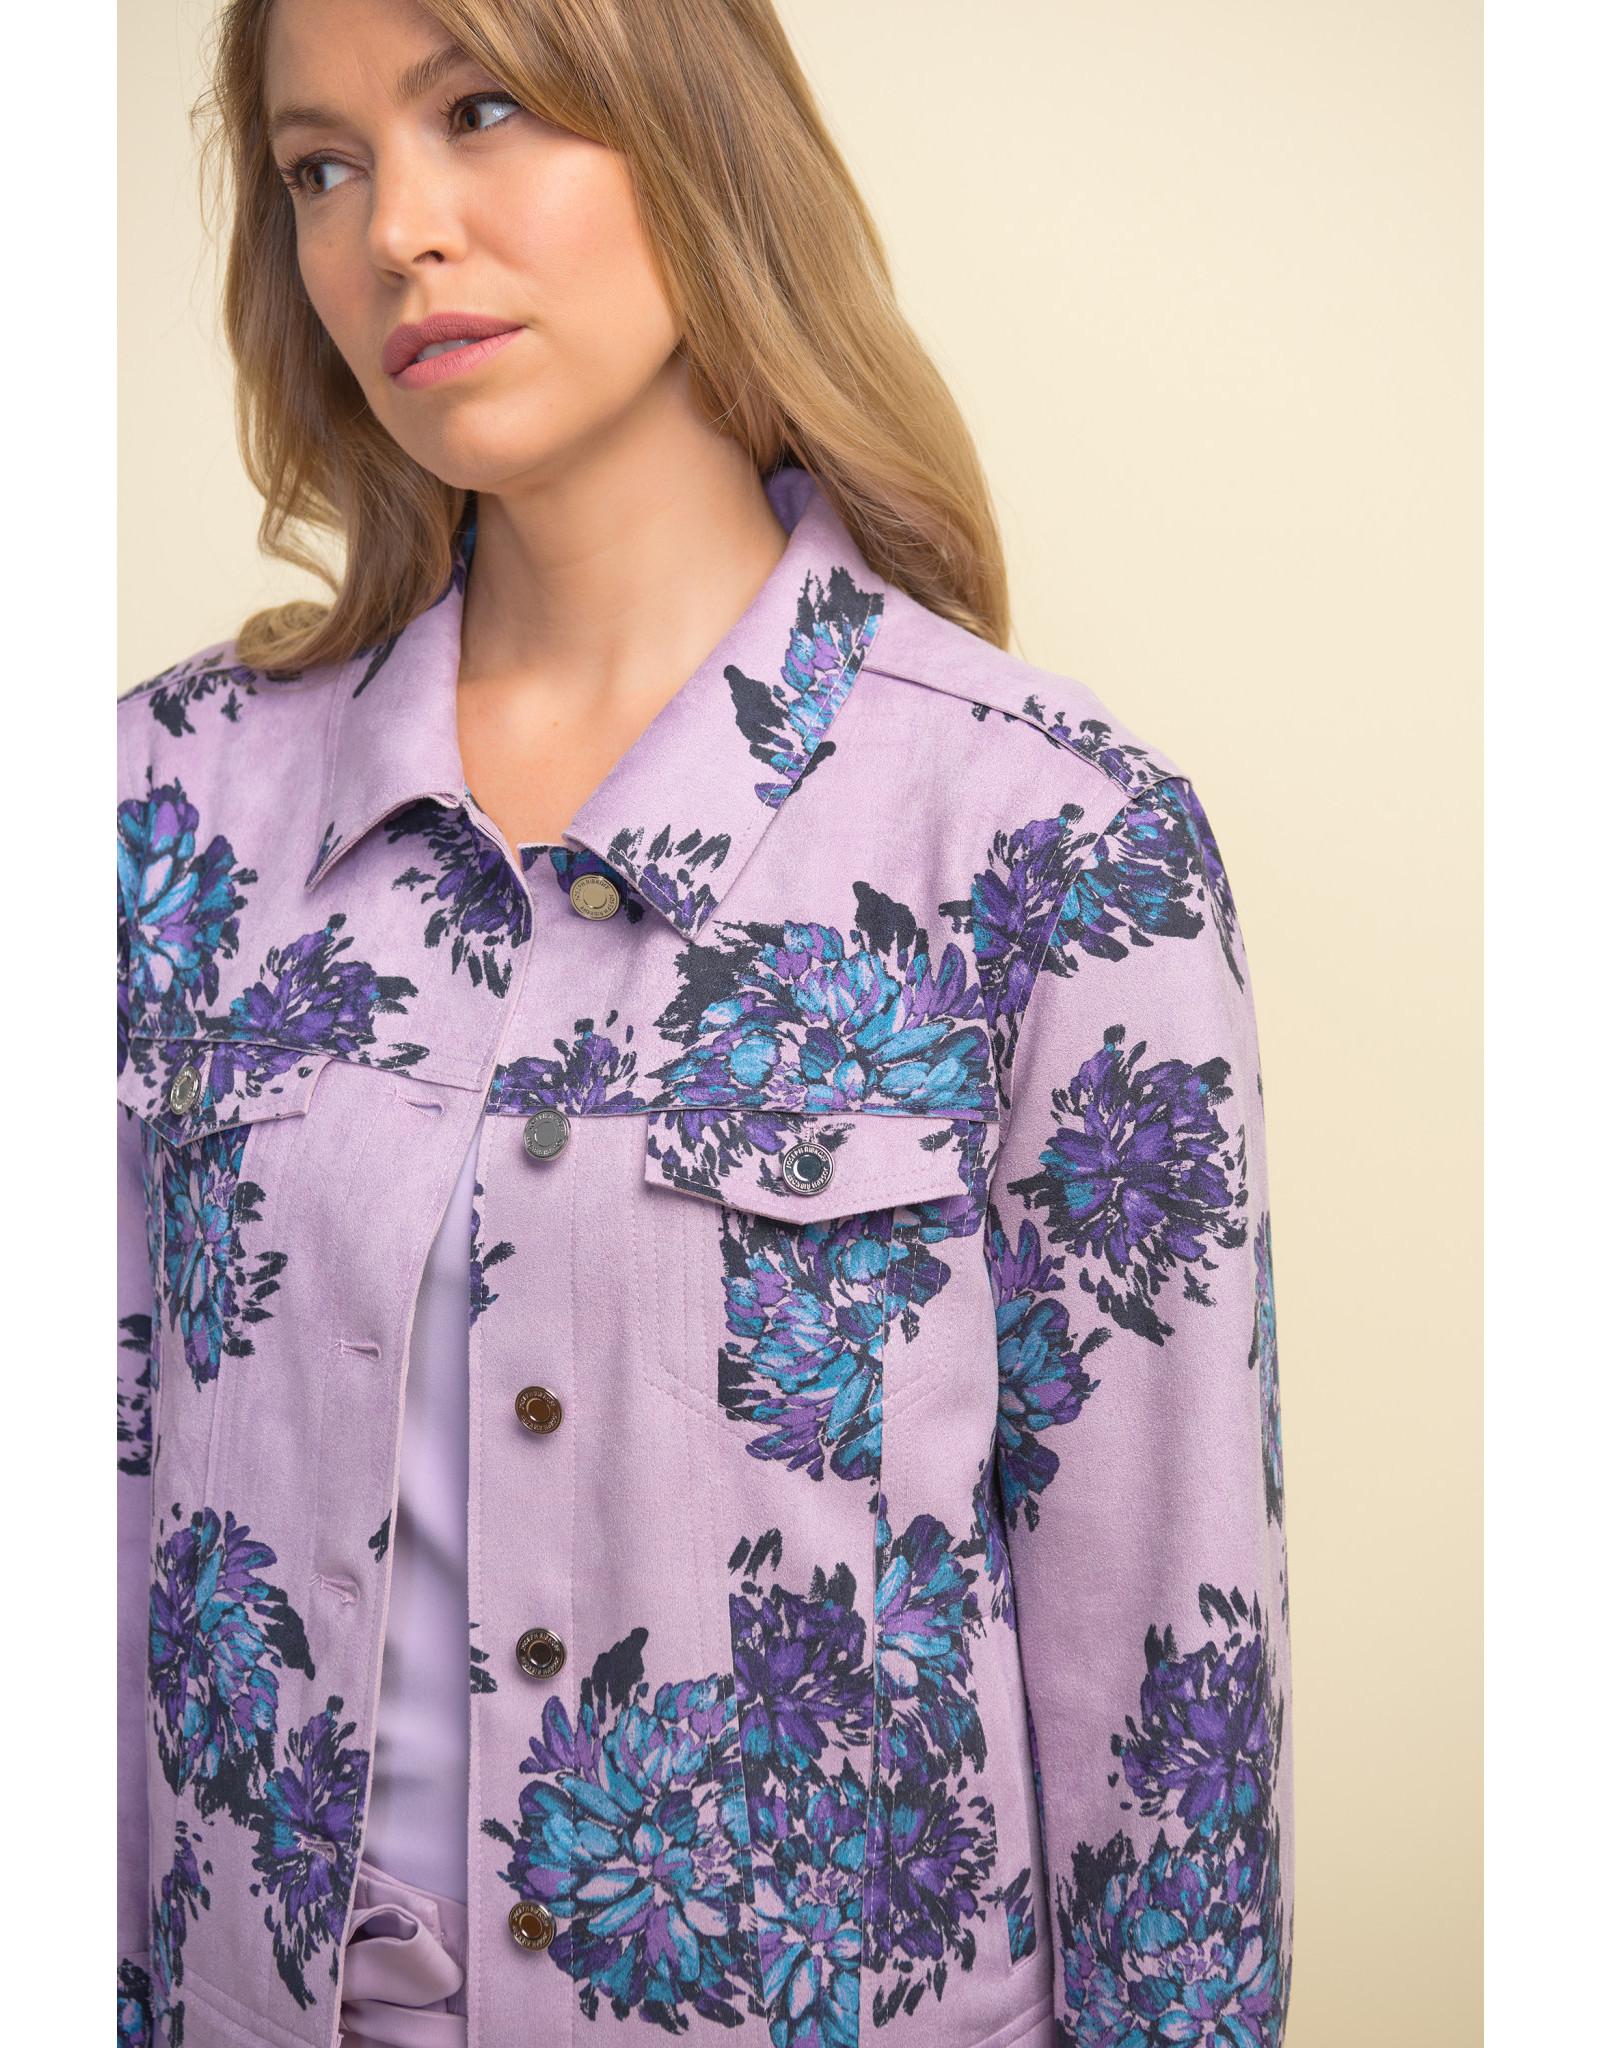 Joseph Ribkoff Floral Jacket